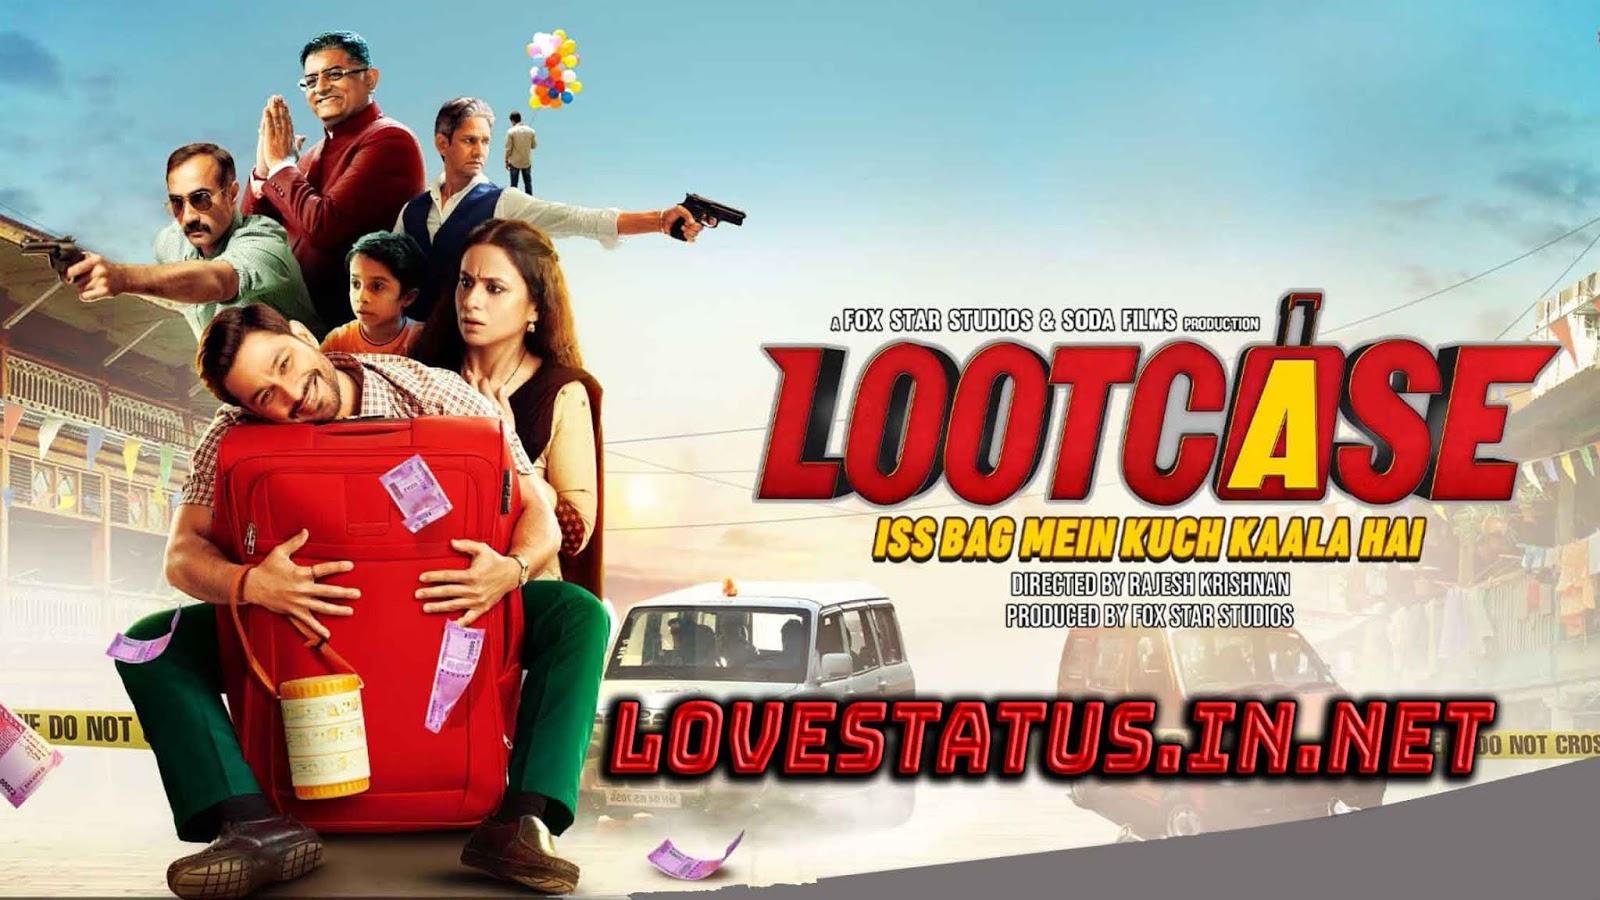 lootcase full movie download pagalmovies